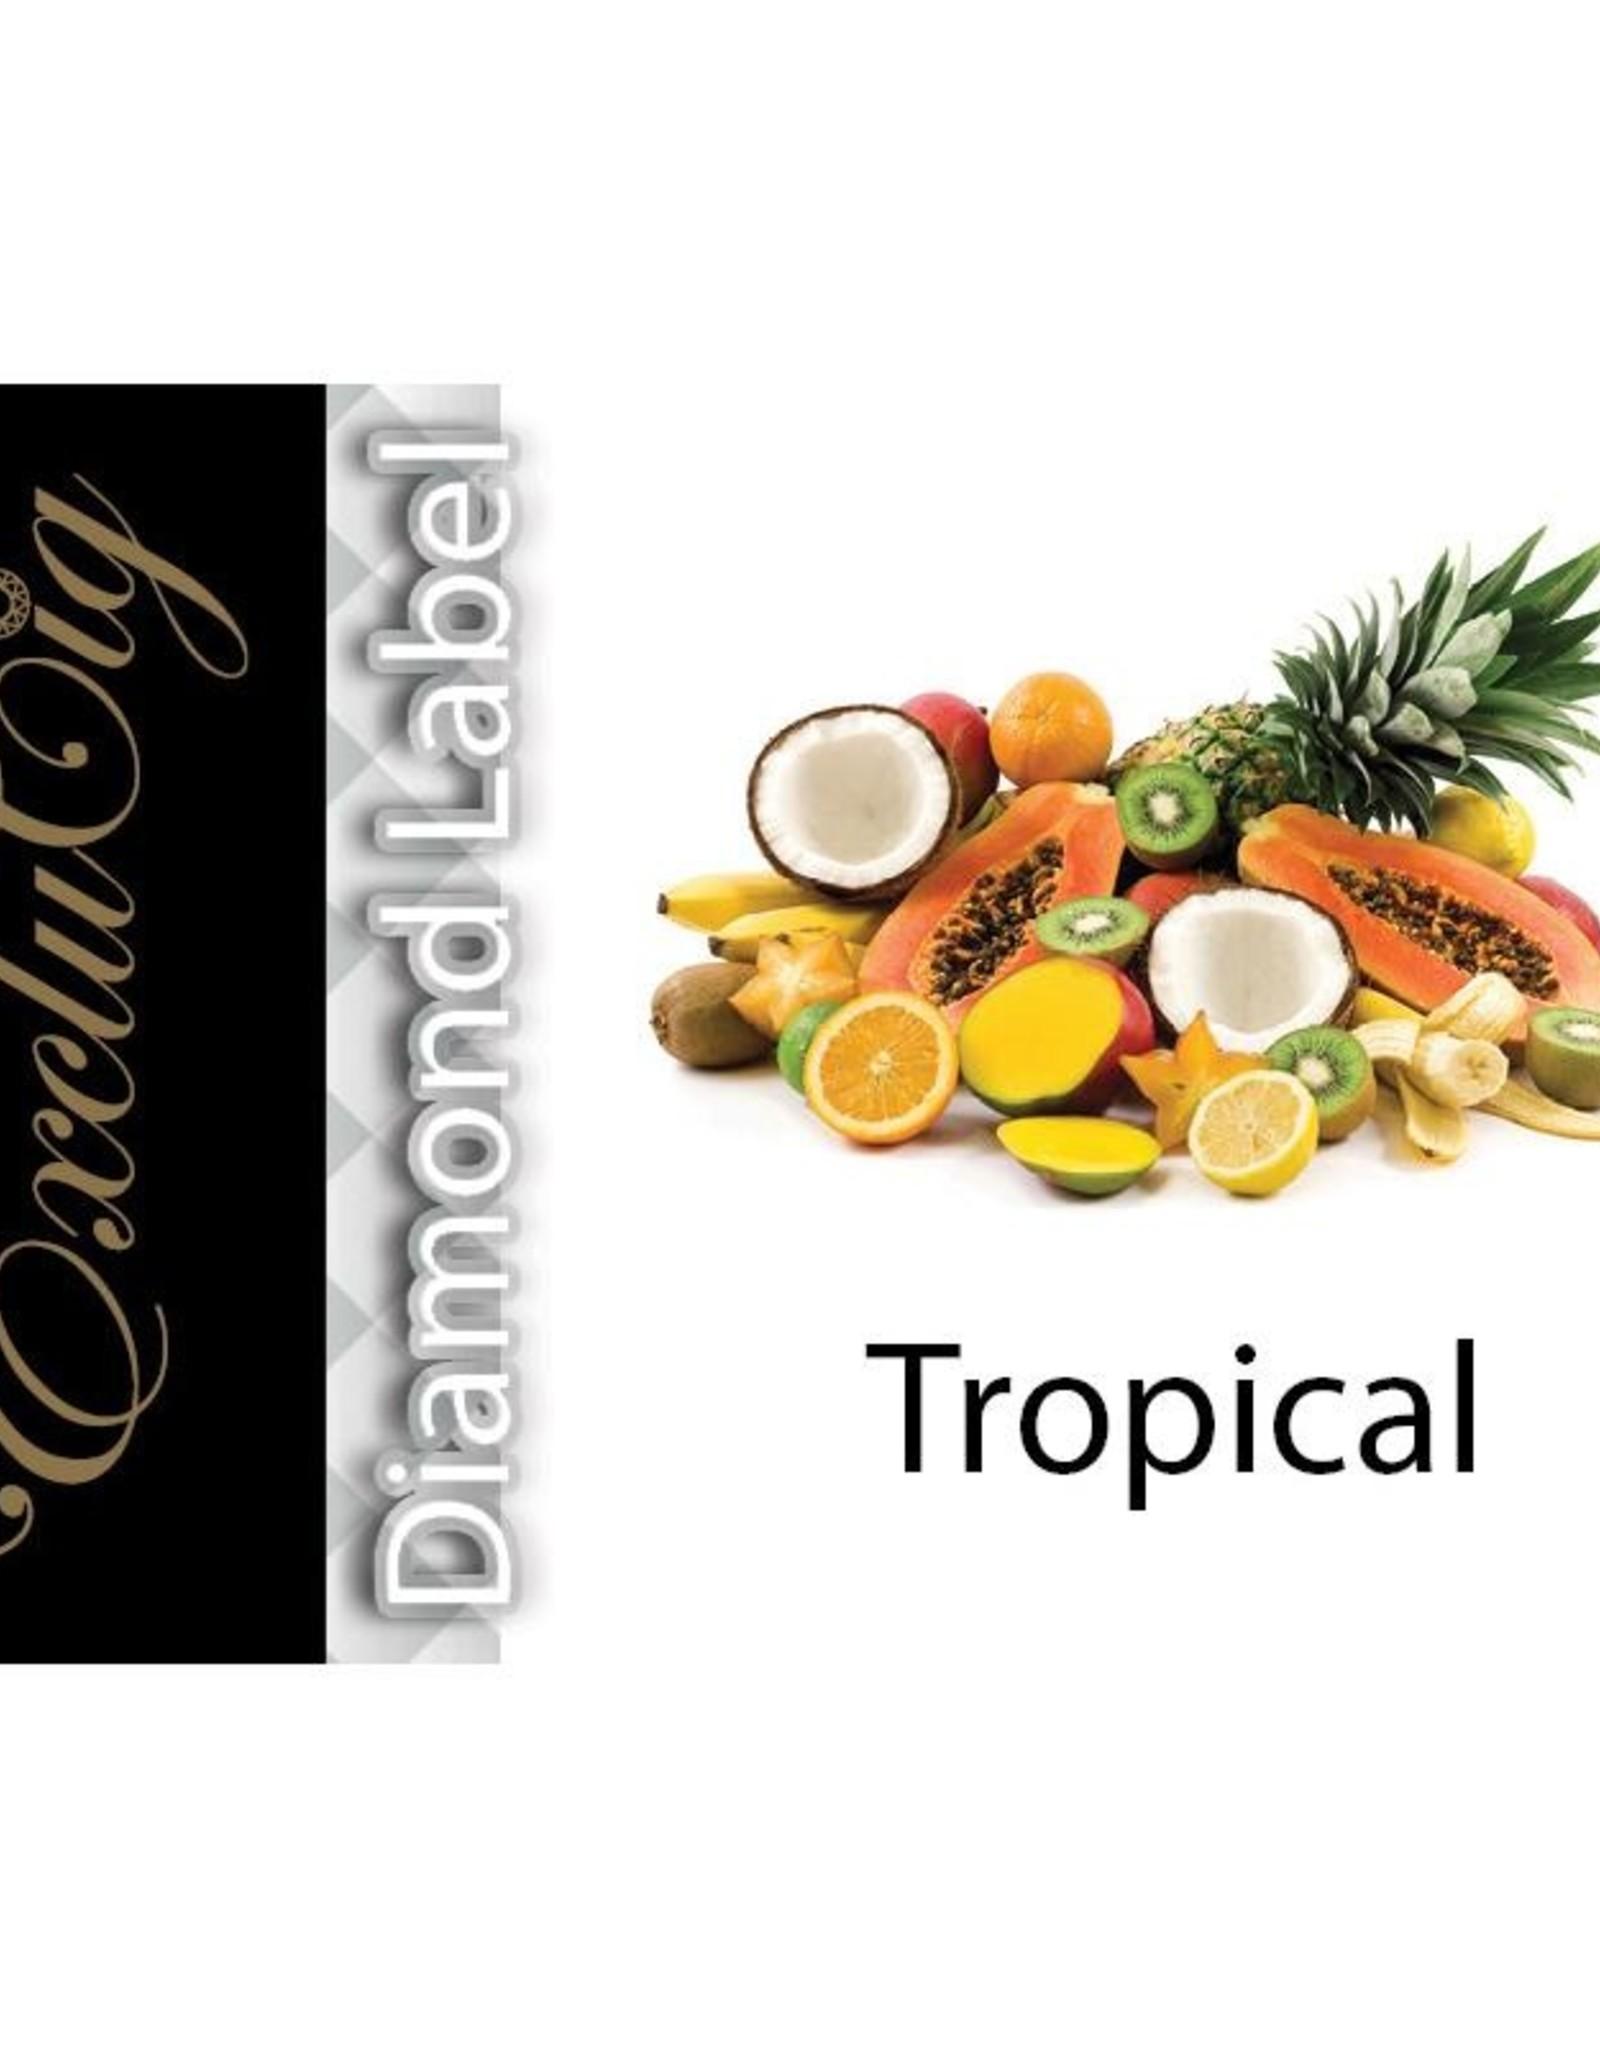 Exclucig Exclucig Diamond Label E-liquid Tropical 0 mg Nicotine